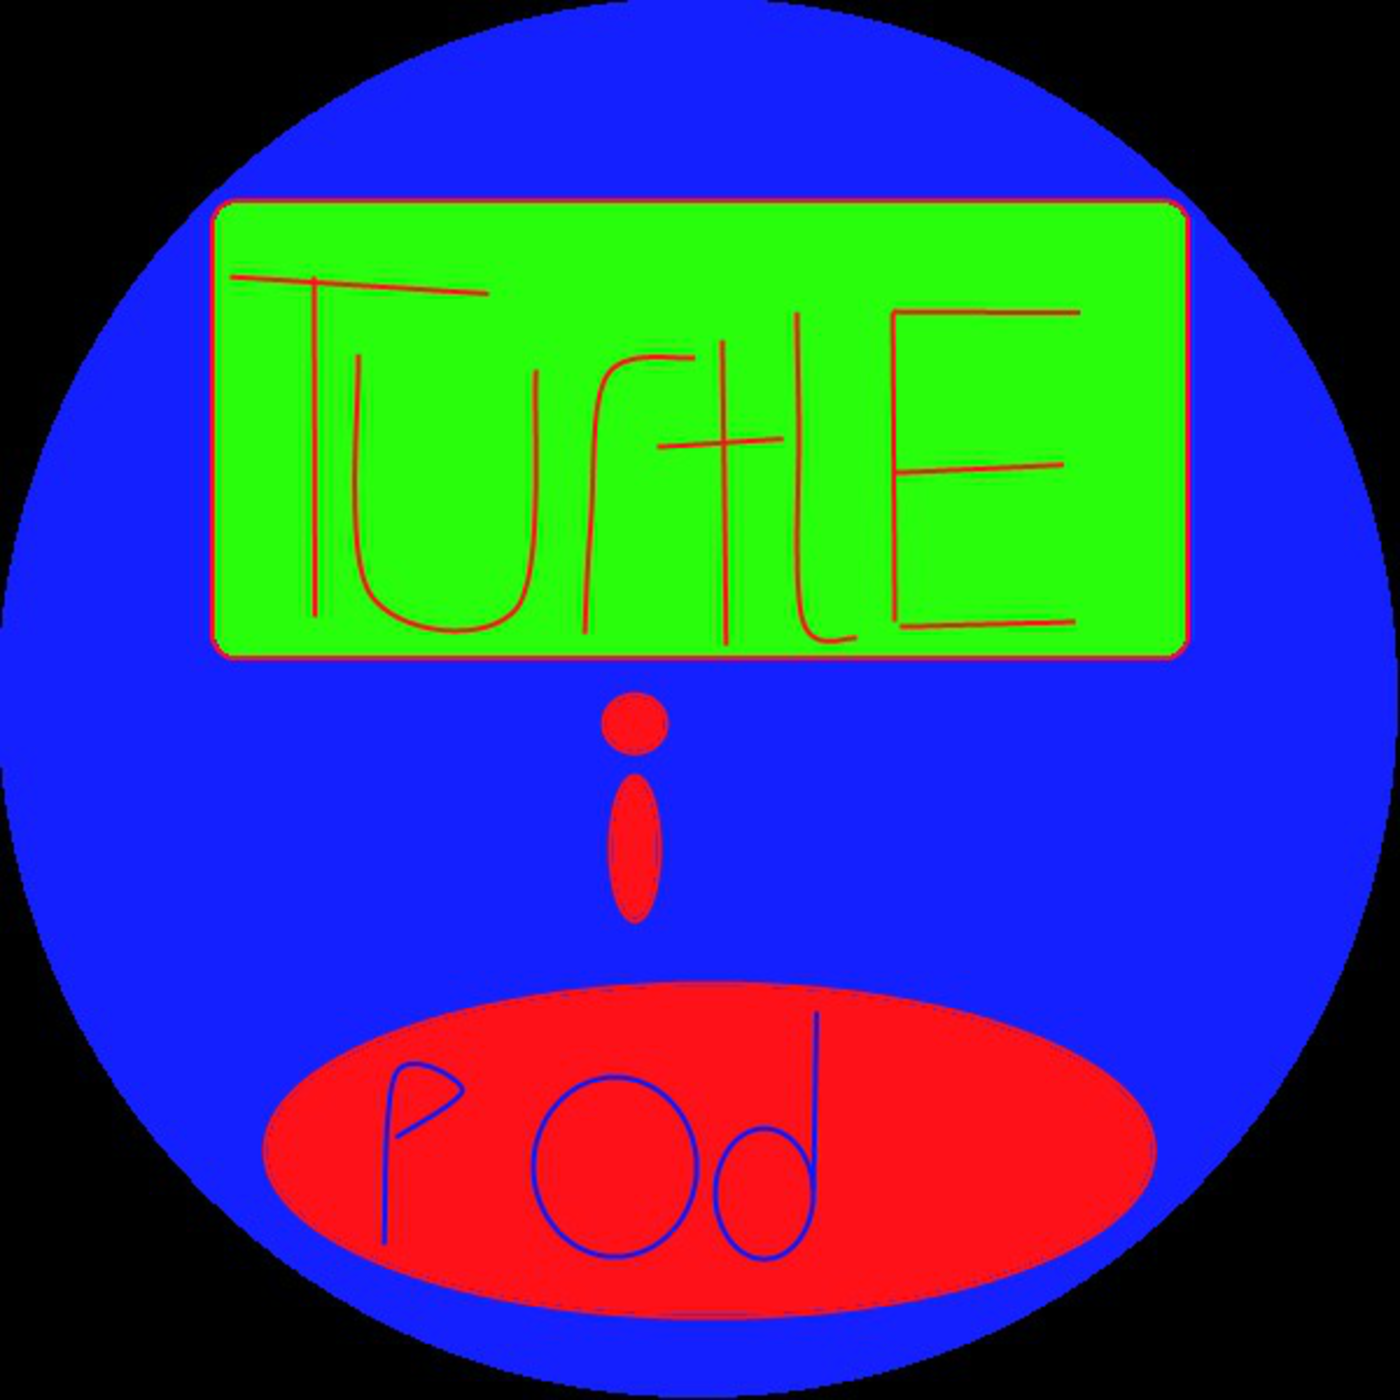 TurtlePod